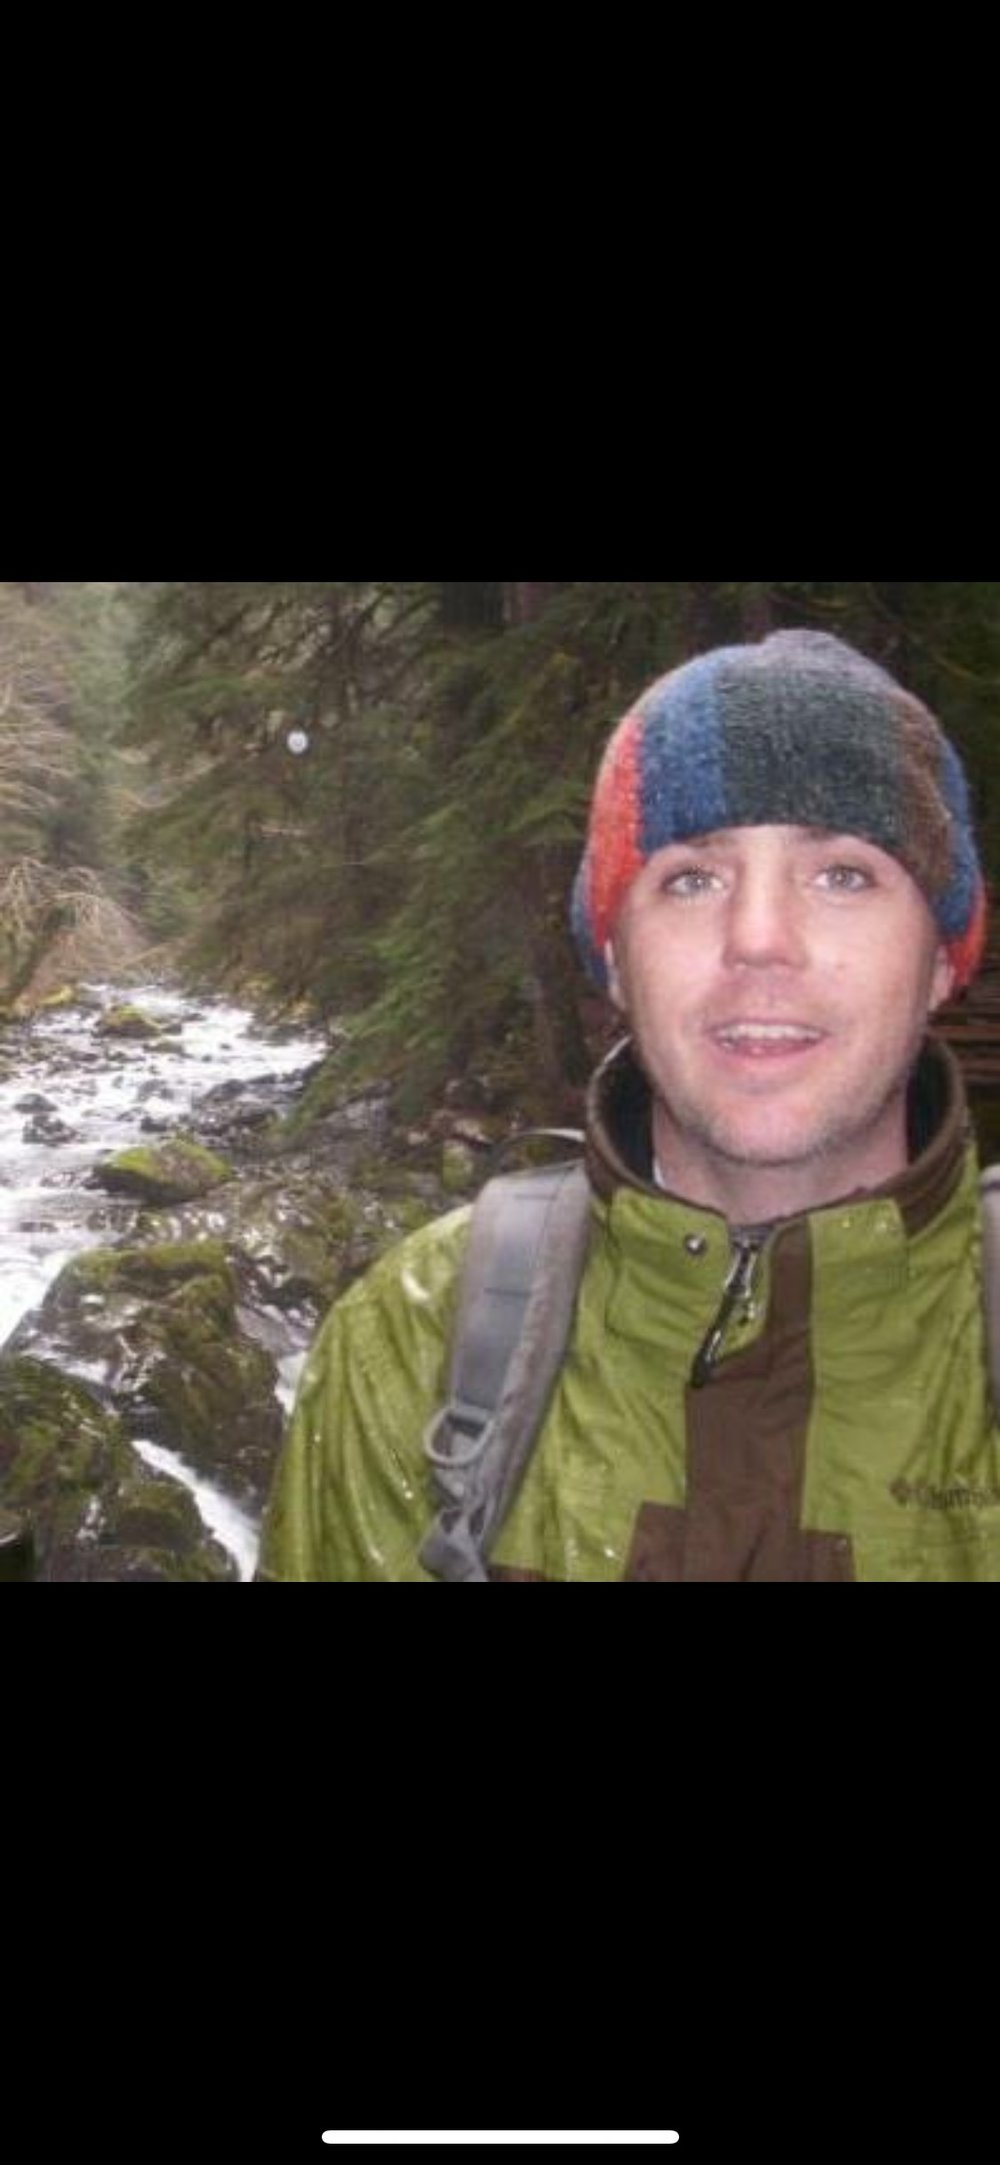 Patrick McGeady - Waterproofing Foreman